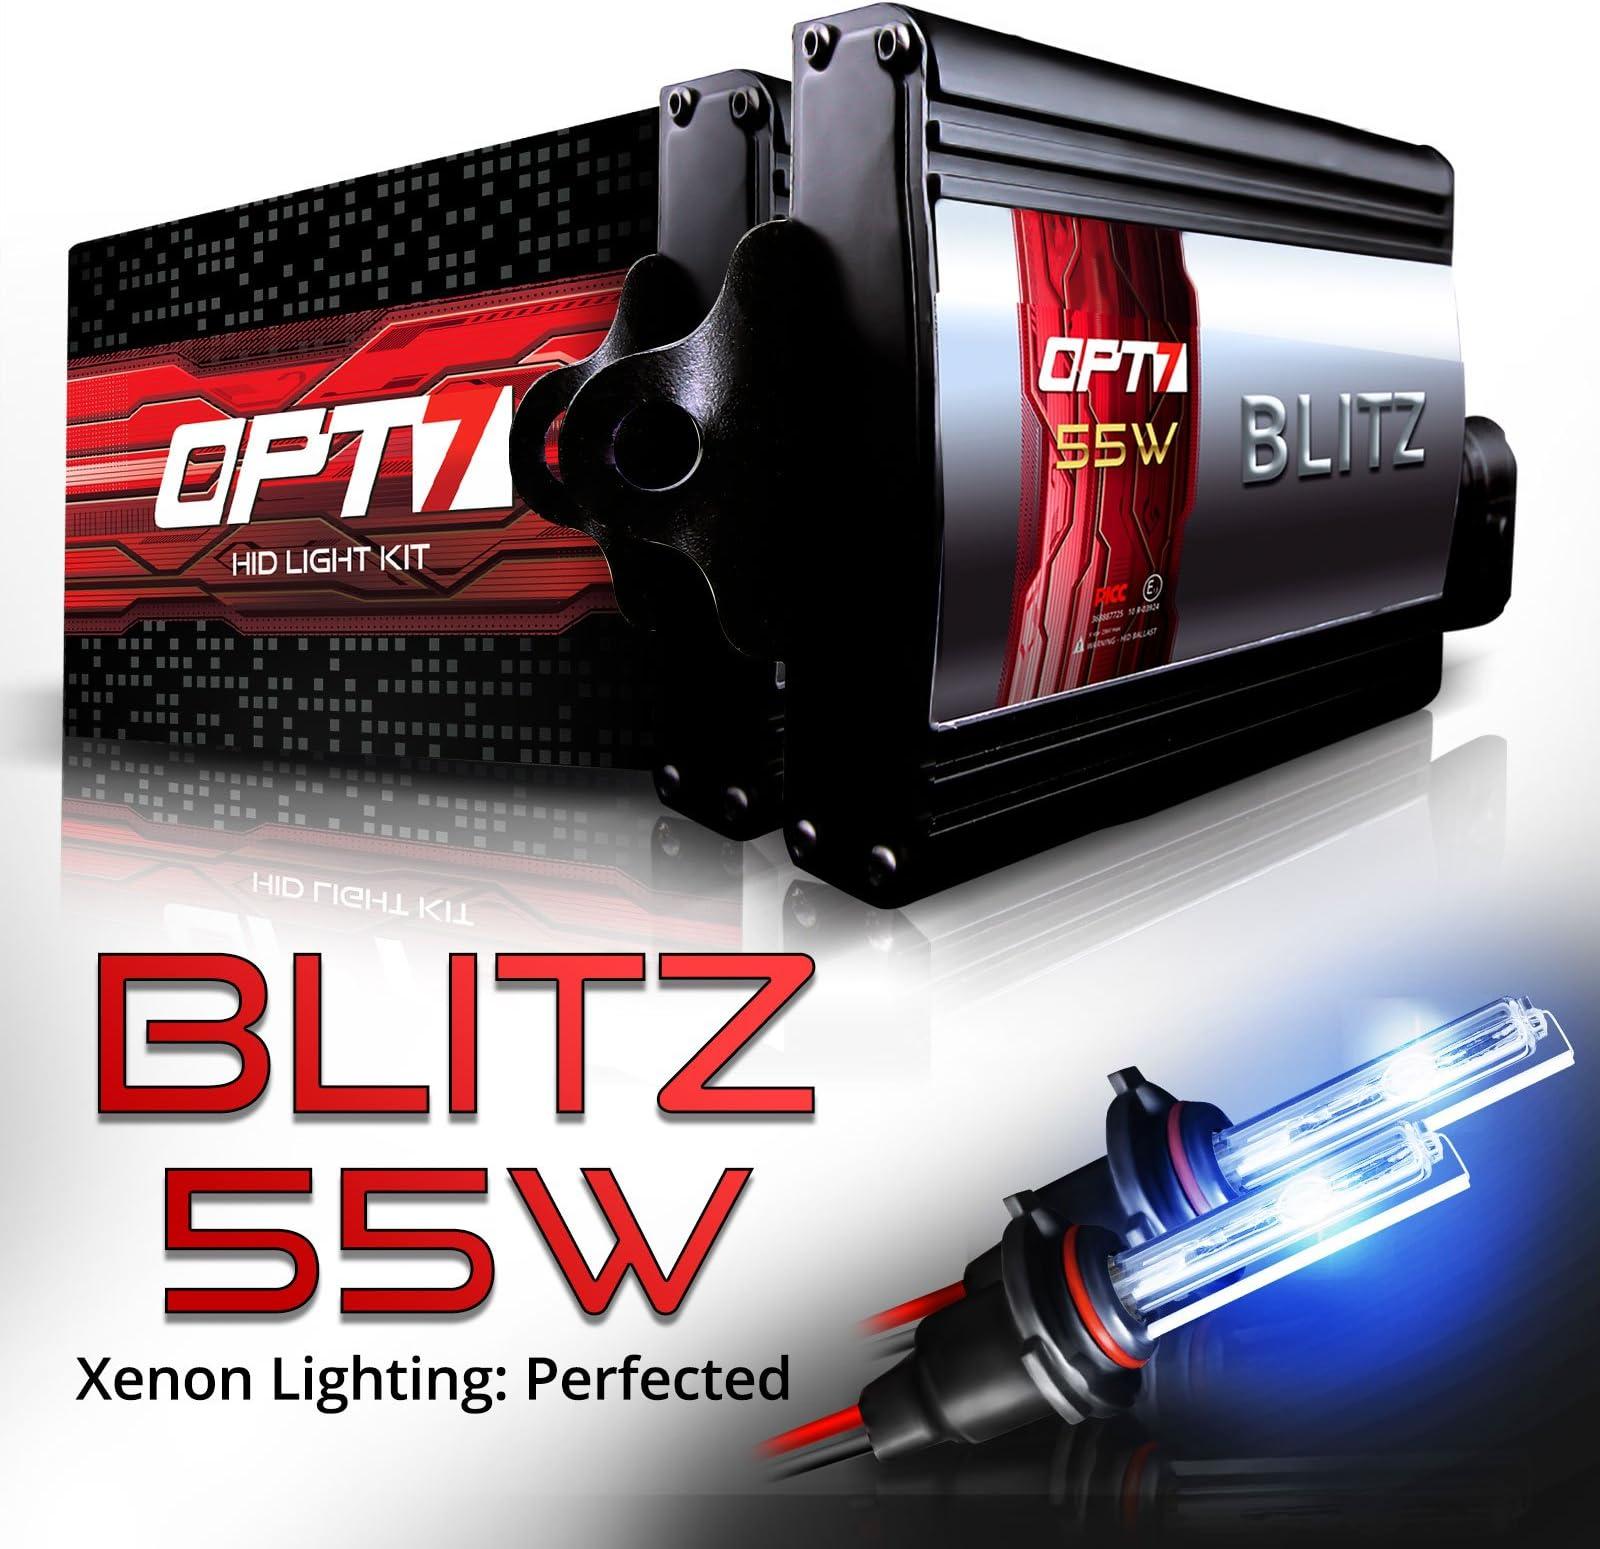 amazon com hid kits lighting conversion kits automotiveopt7 blitz 55w 9006 hid kit 5x brighter 4x longer life all bulb